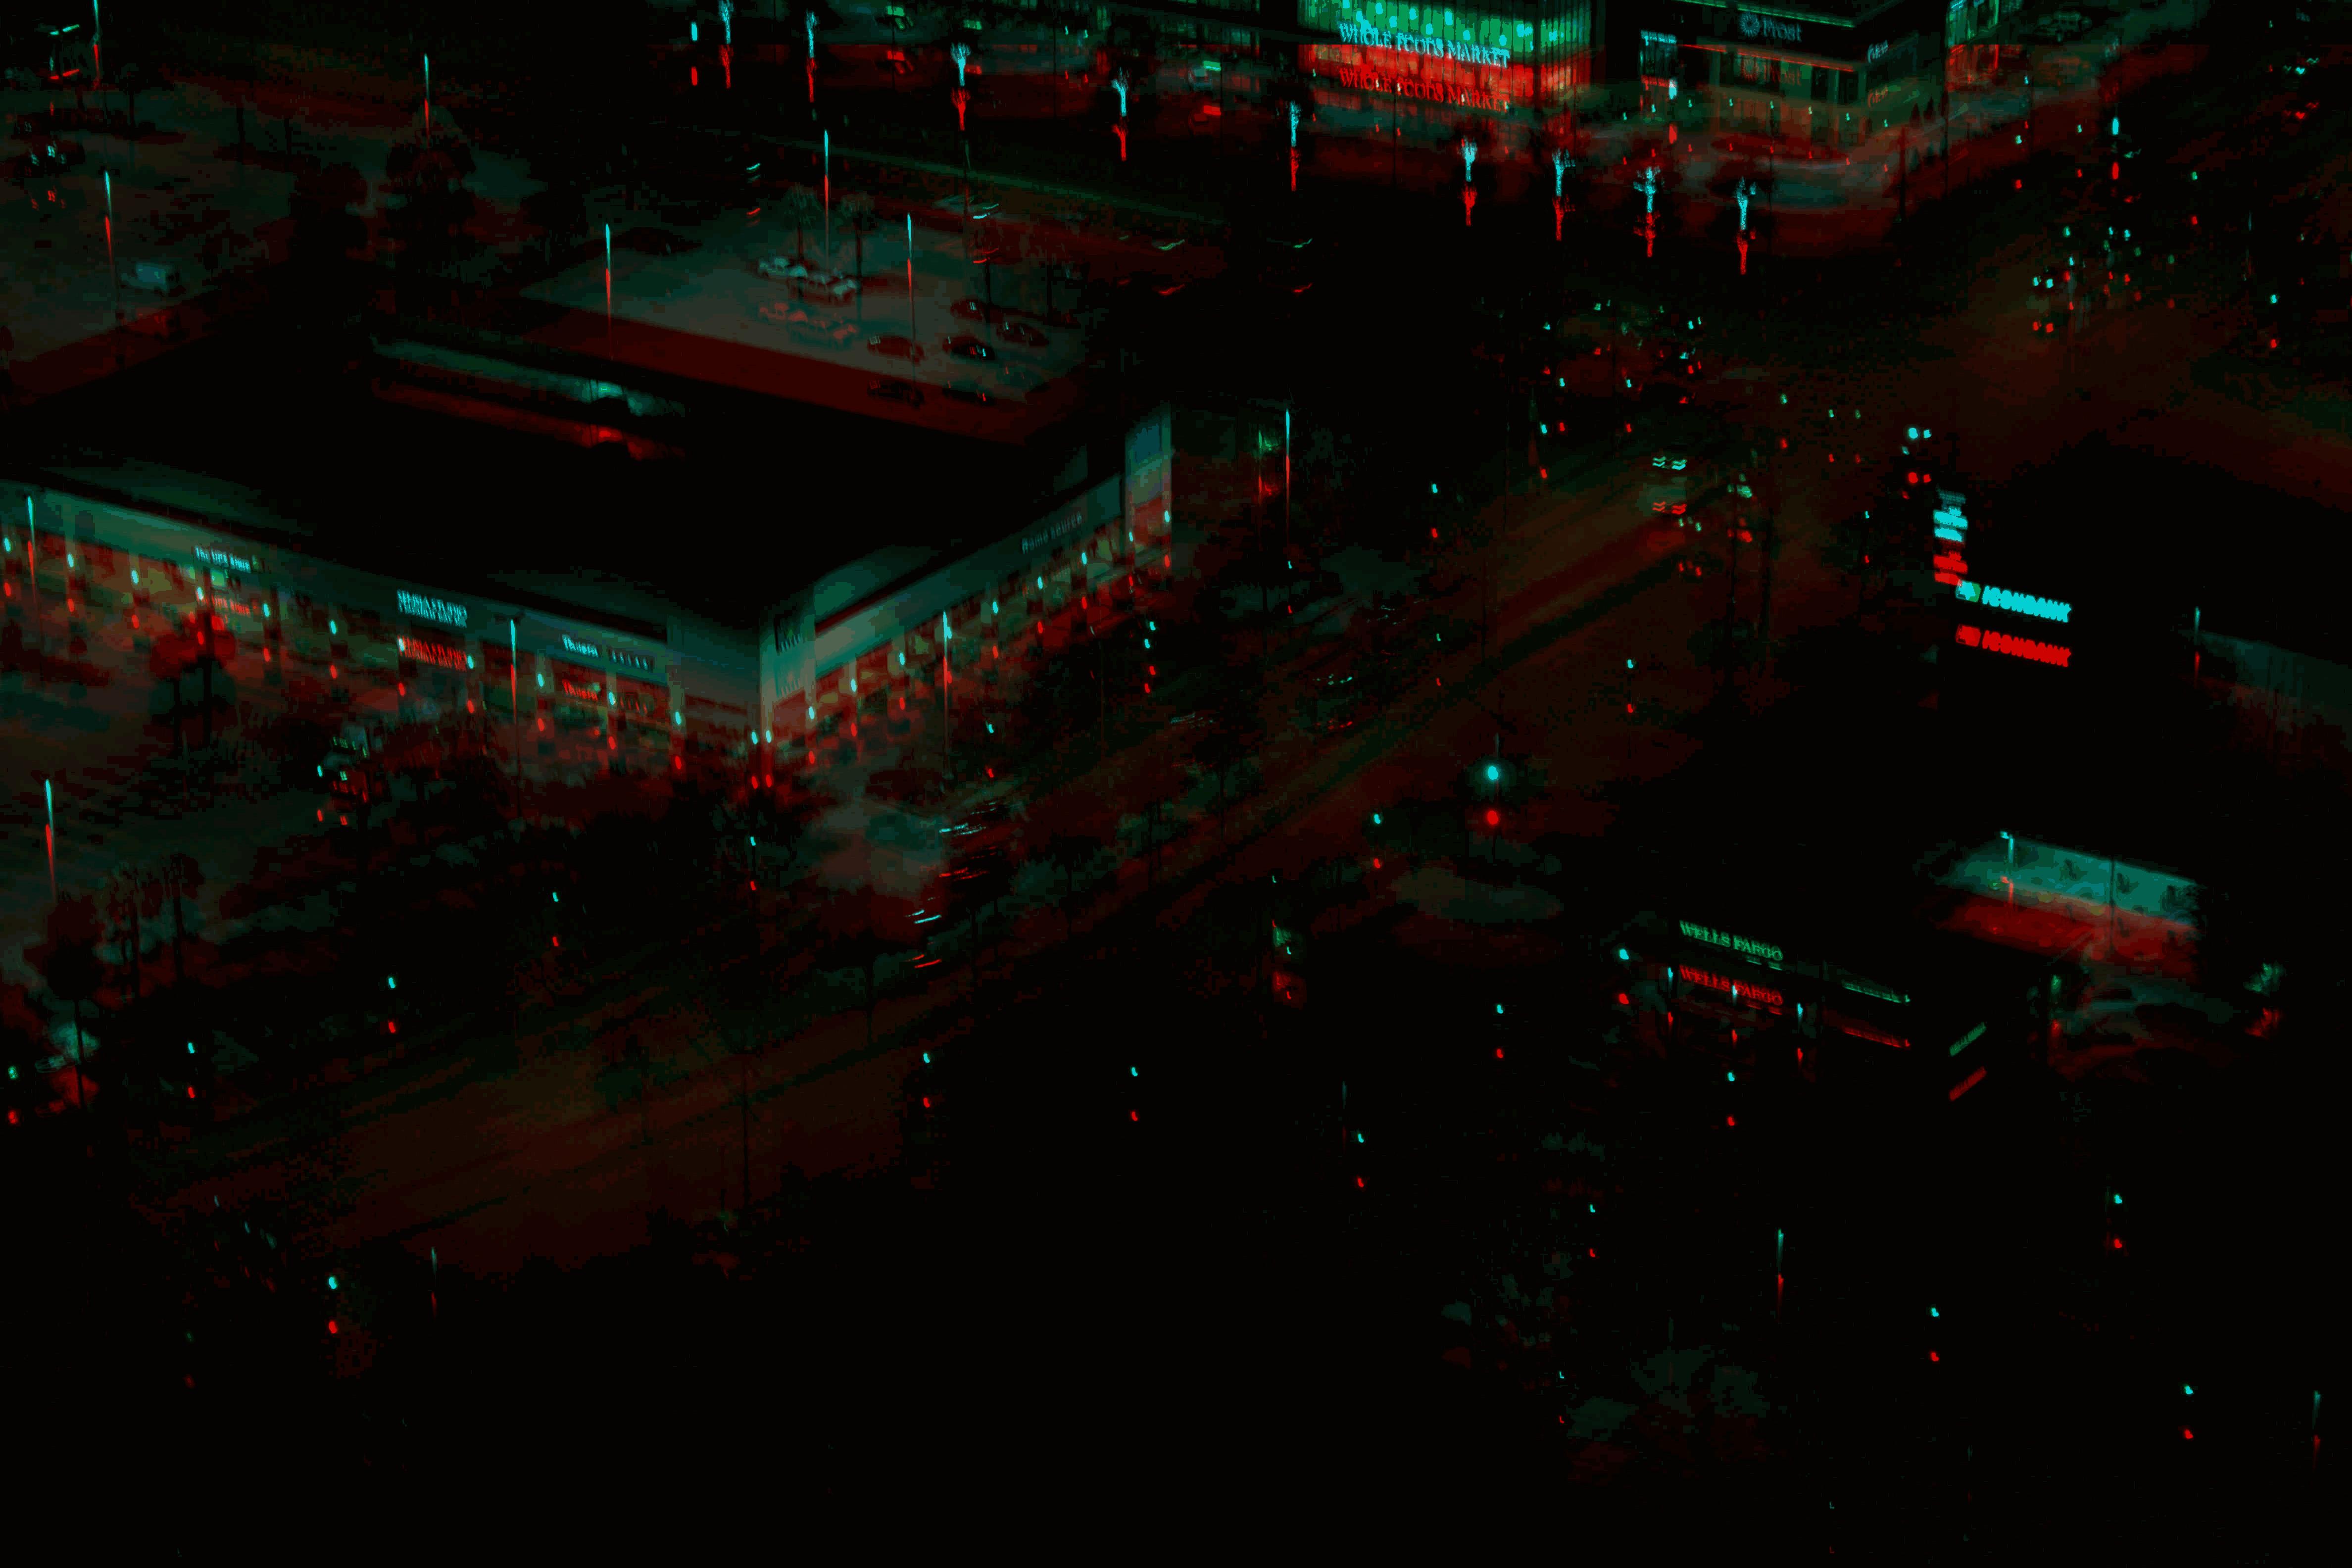 gnu3/img/glitch/corner.jpg